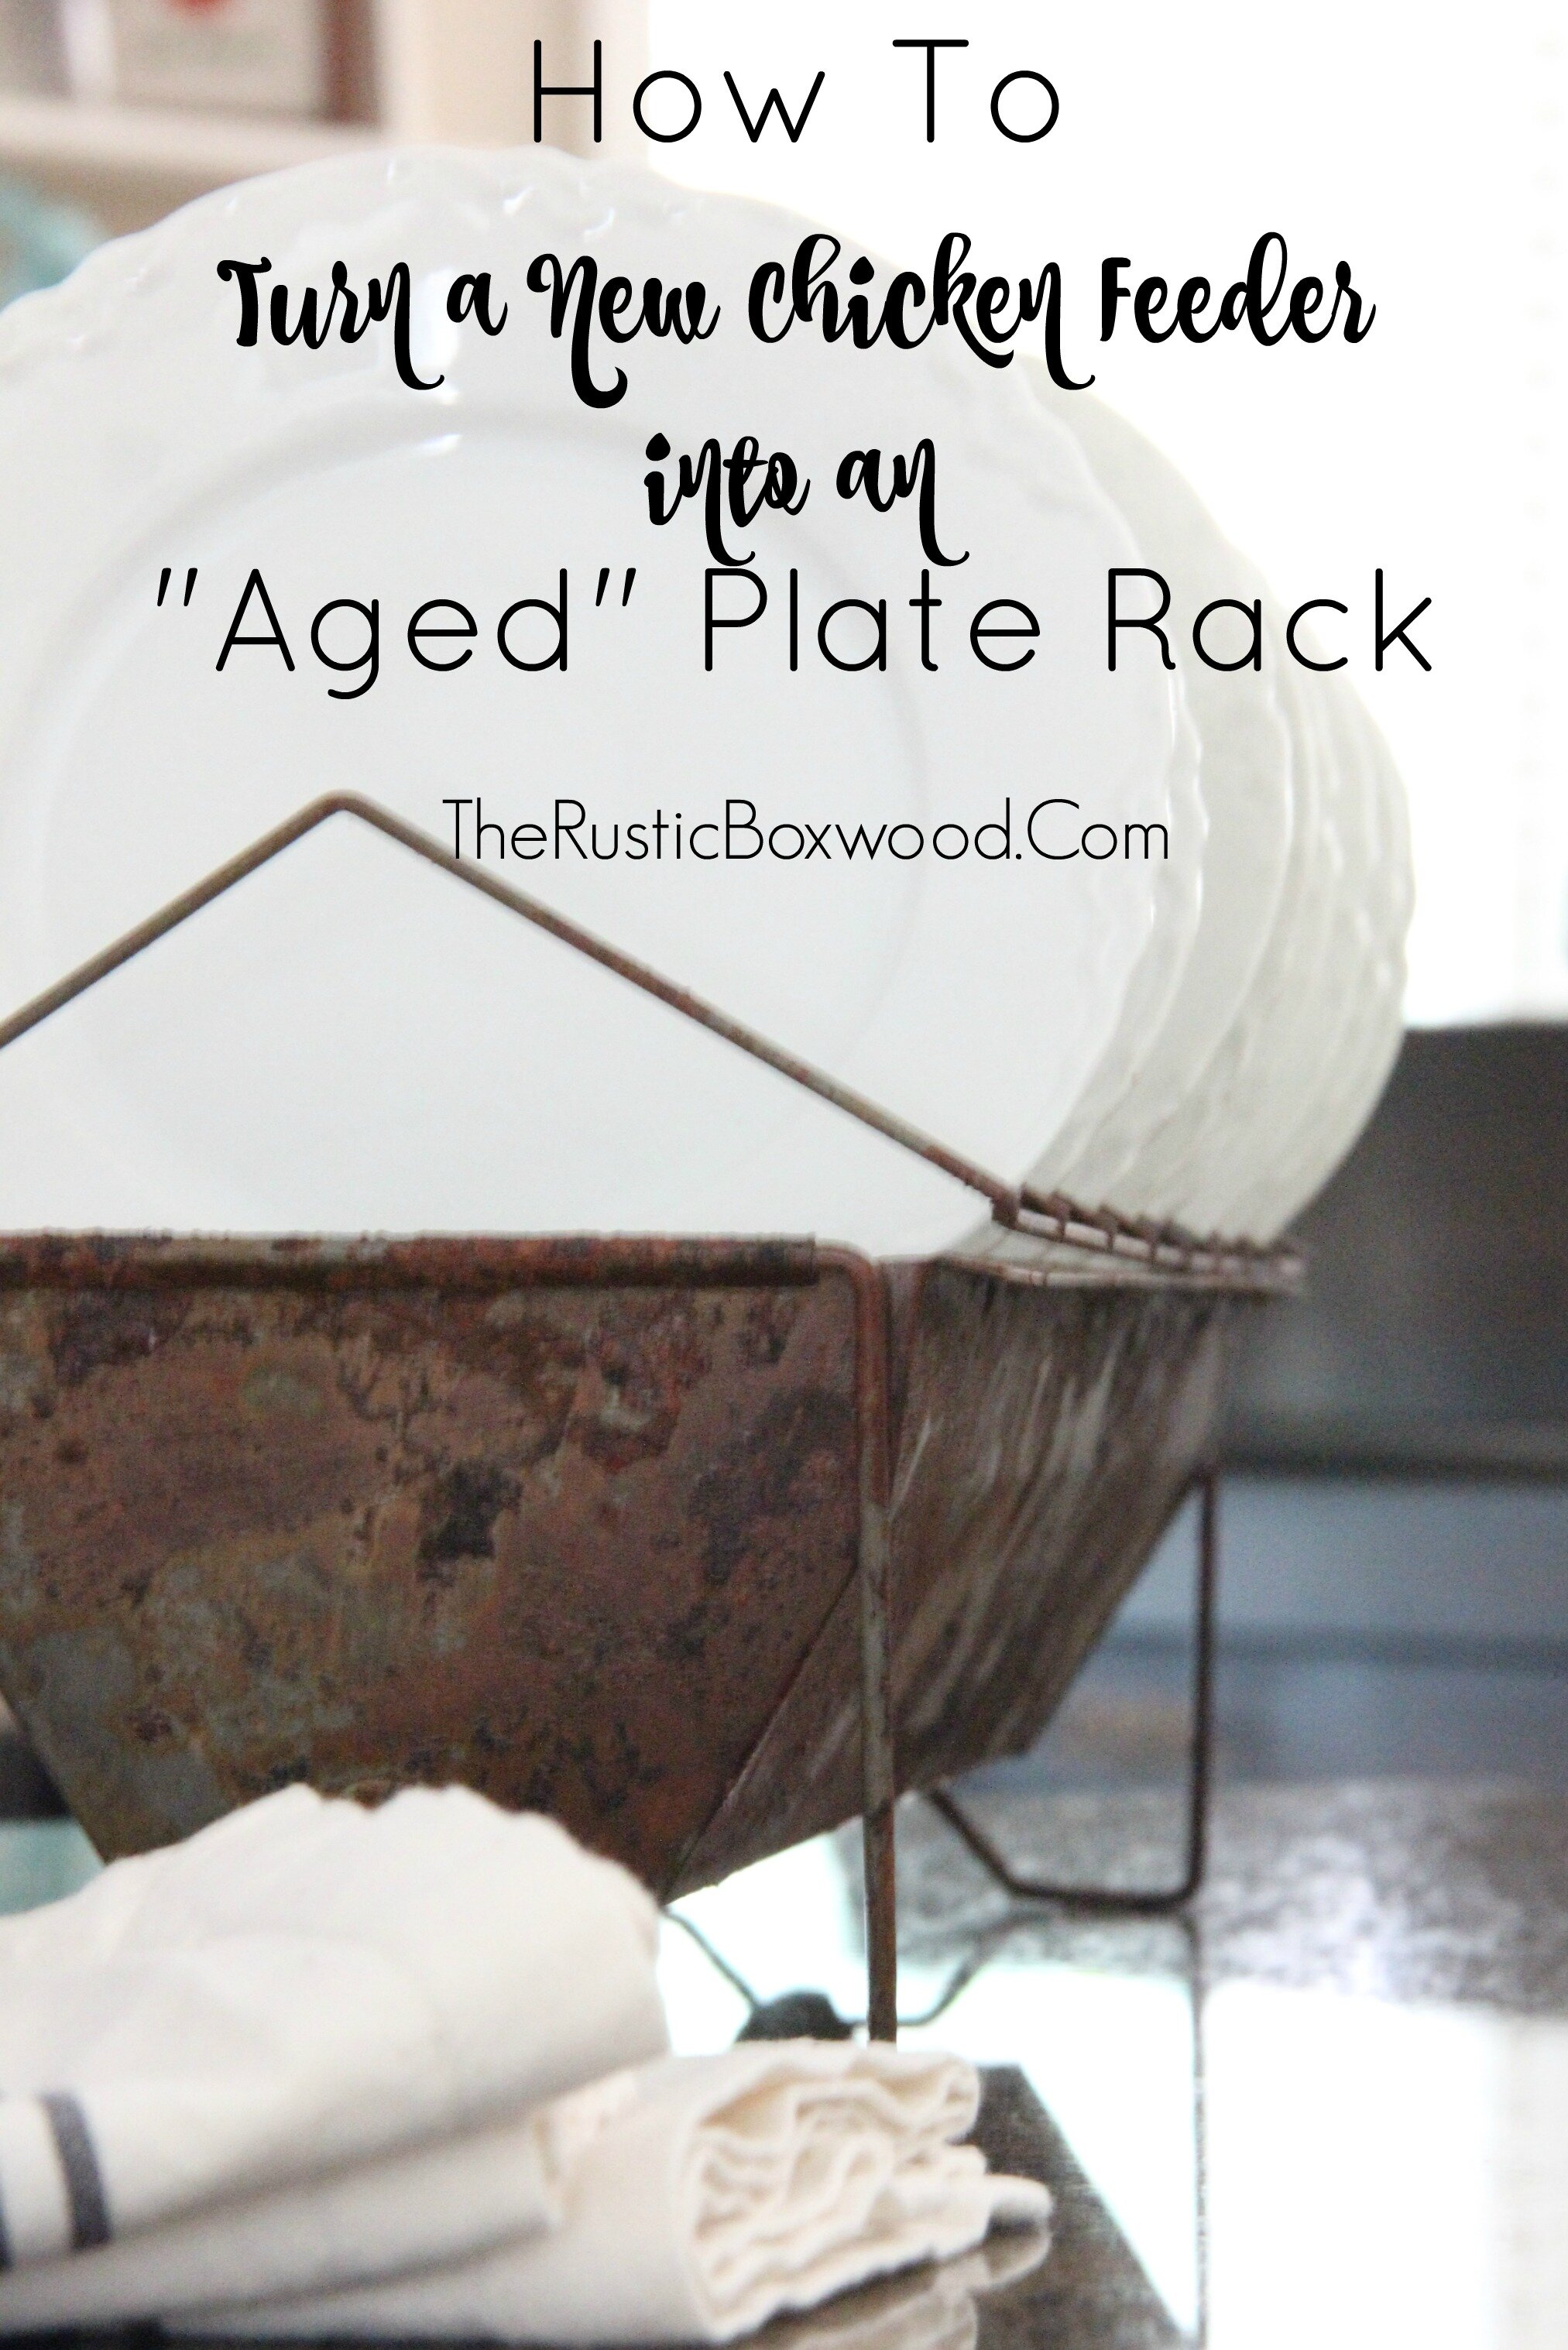 aged plate rack